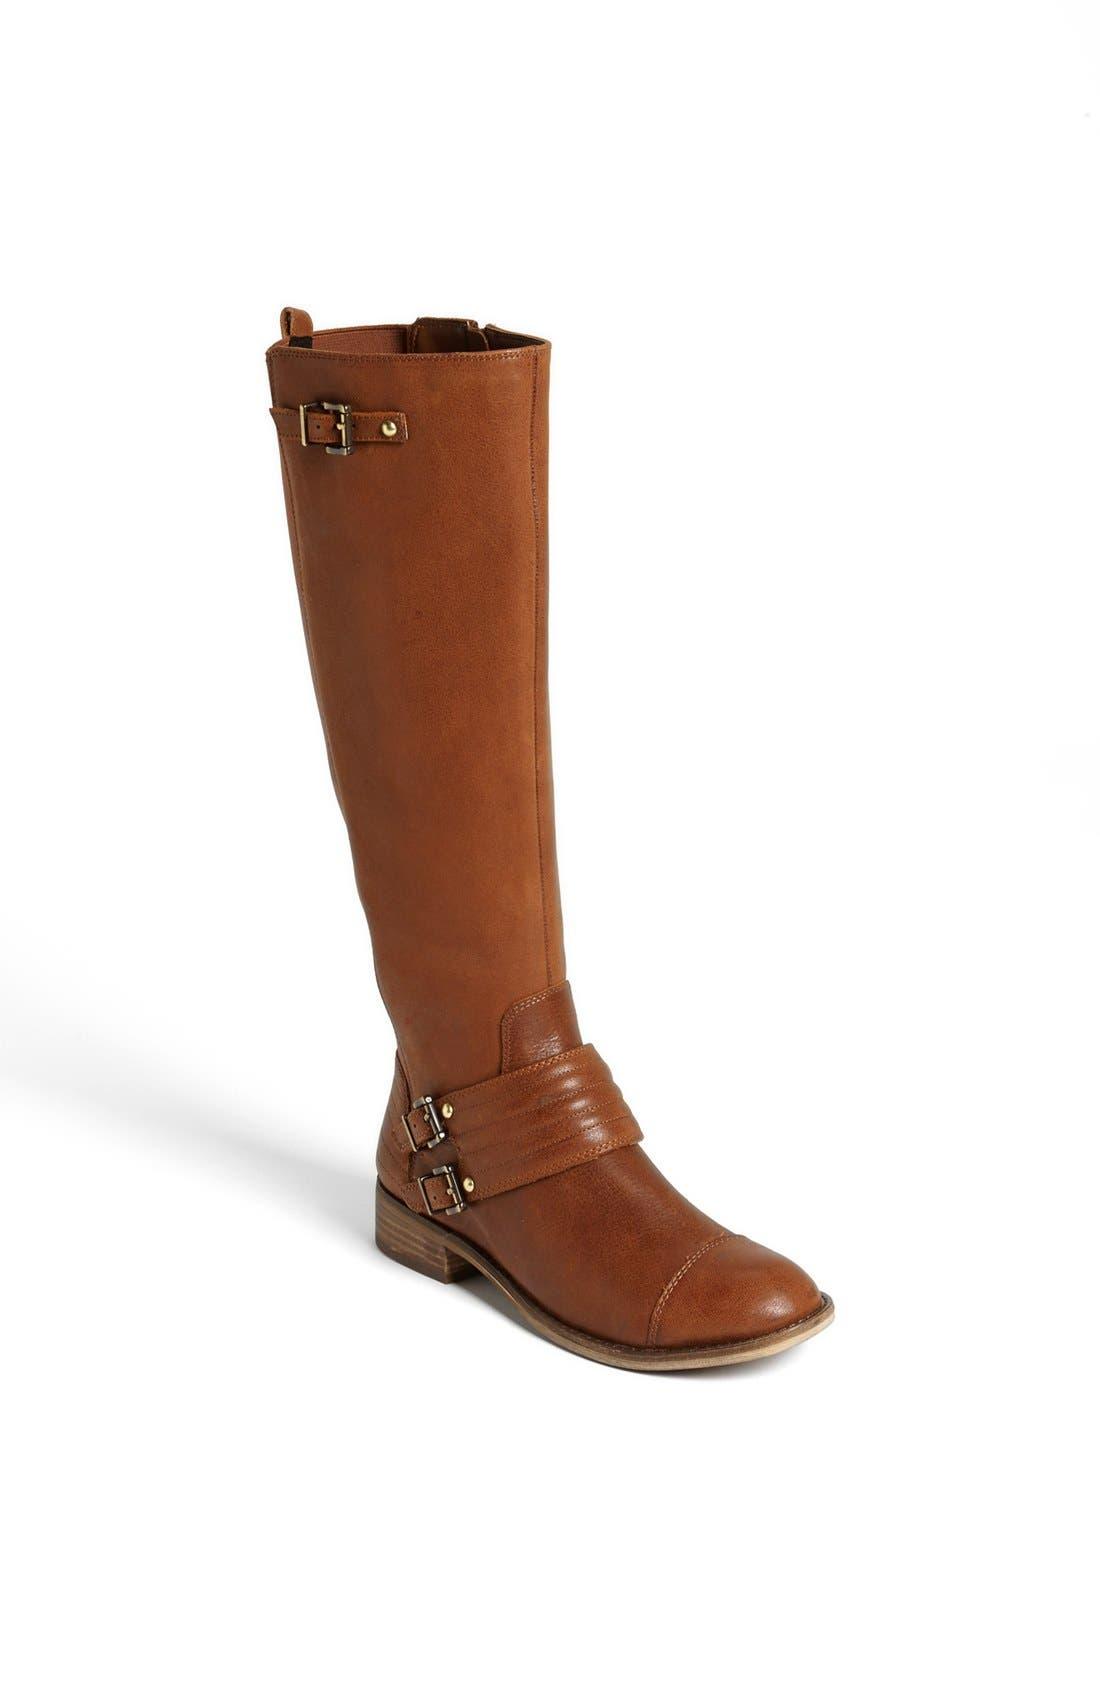 Alternate Image 1 Selected - Jessica Simpson 'Elmont' Boot (Wide Calf)